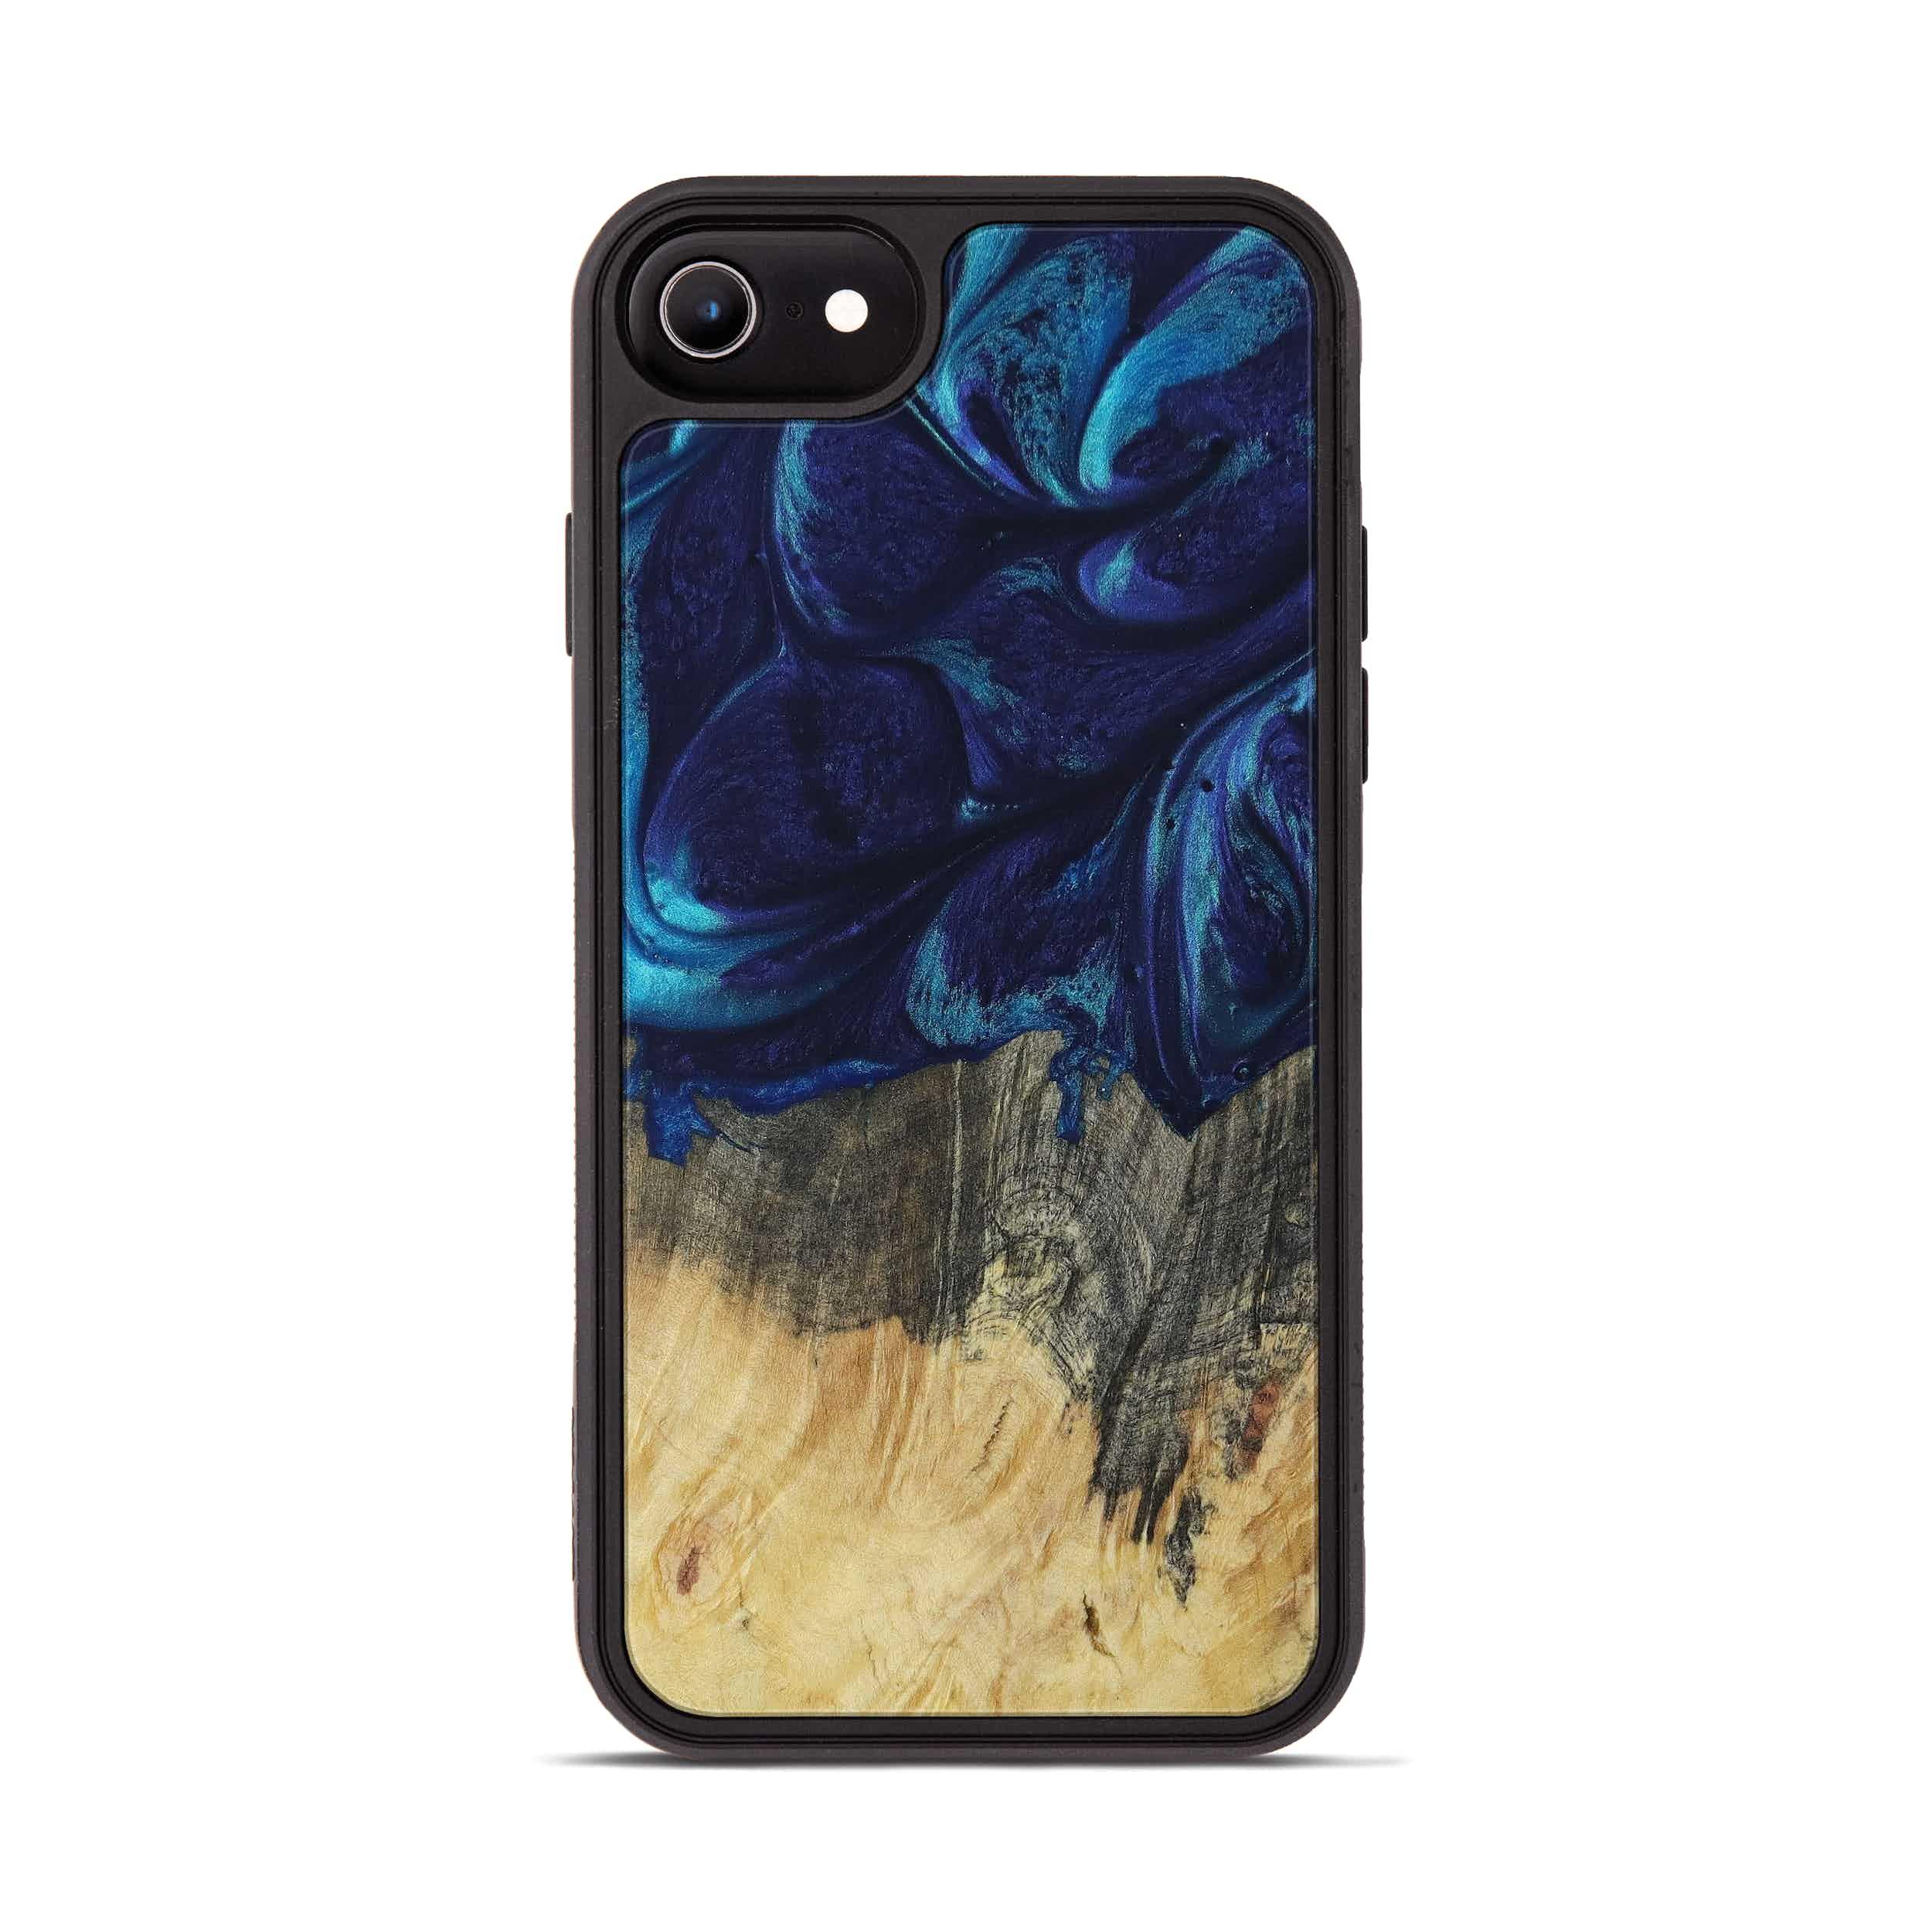 iPhone 7 Wood+Resin Phone Case - Laurie (Dark Blue, 399287)